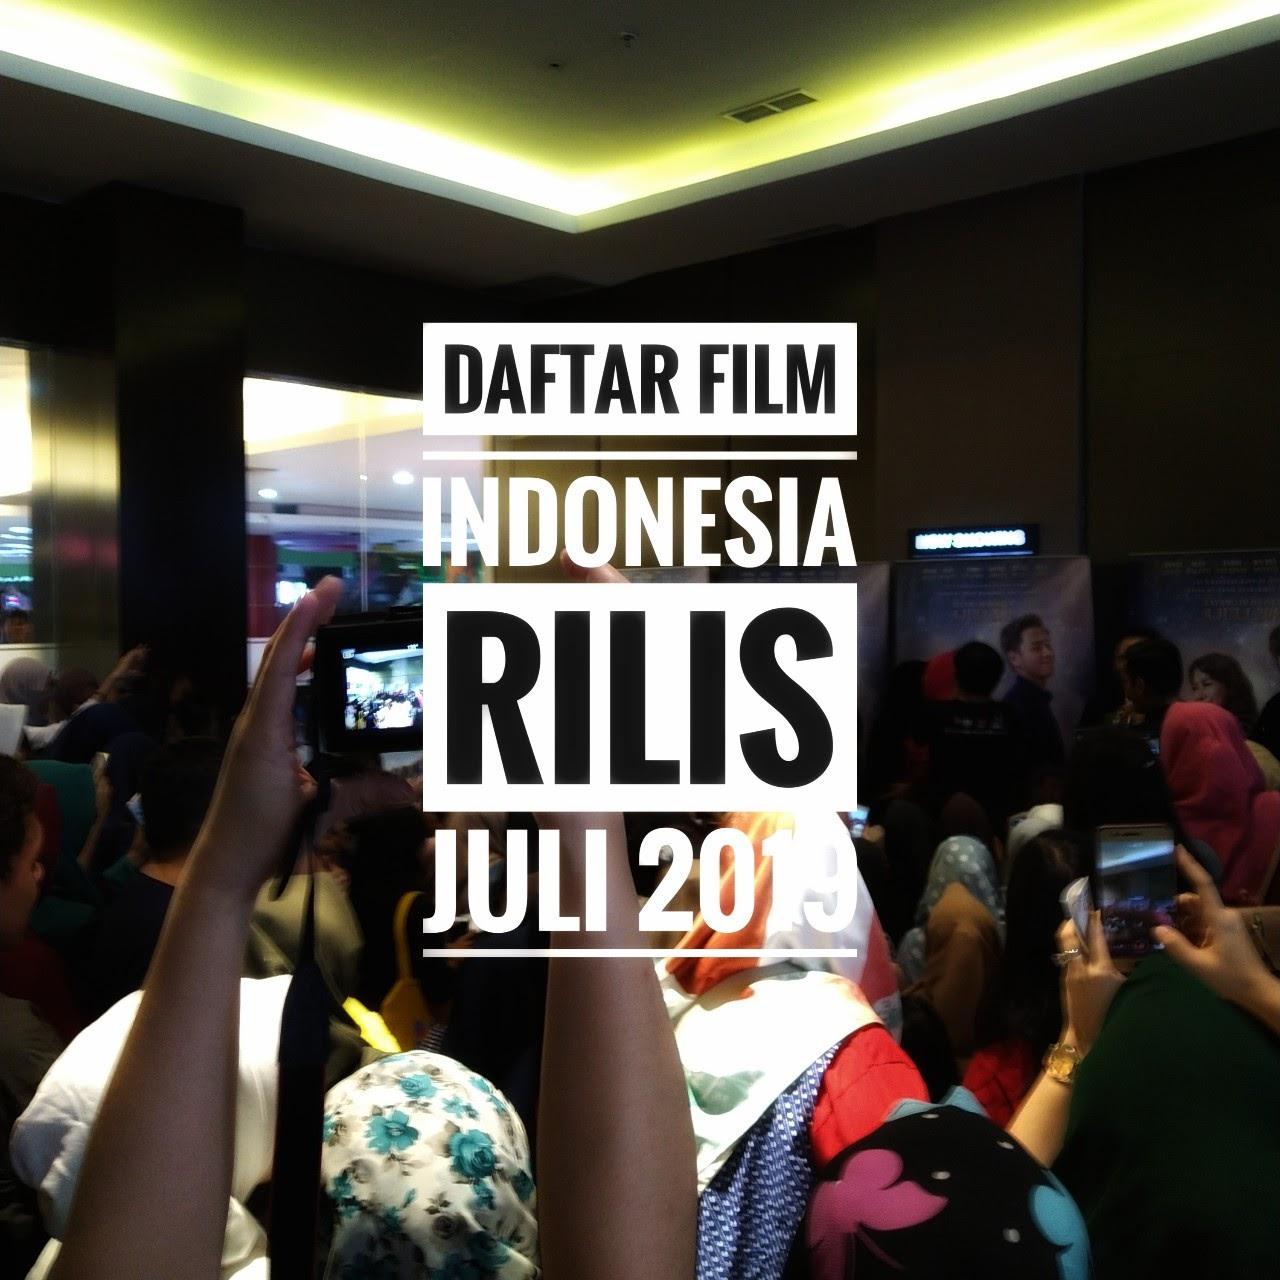 Daftar Film Indonesia yang Rilis Bulan Juli 2019